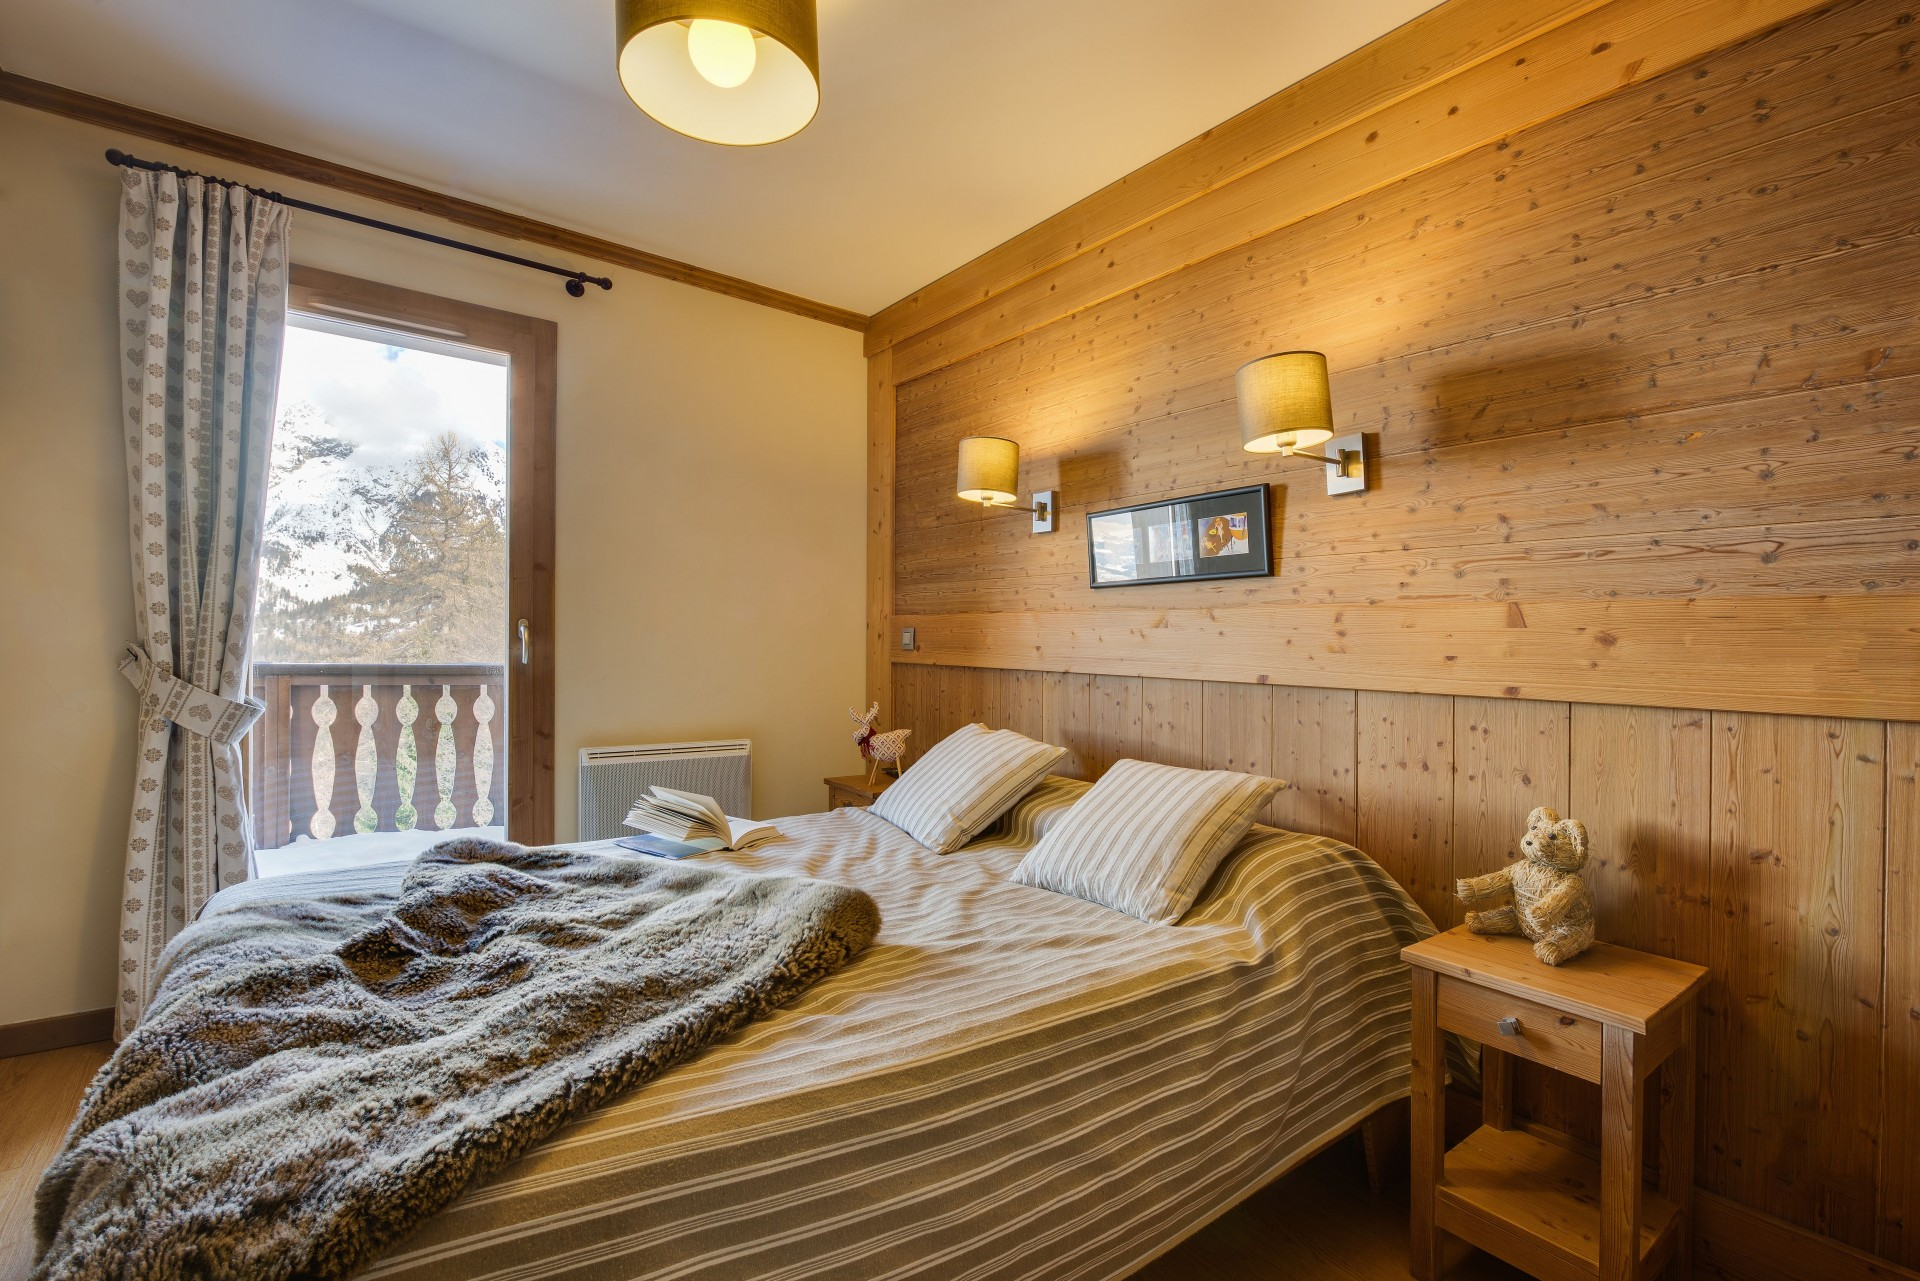 Sainte Foy Tarentaise Location Appartement Luxe Ronite Chambre